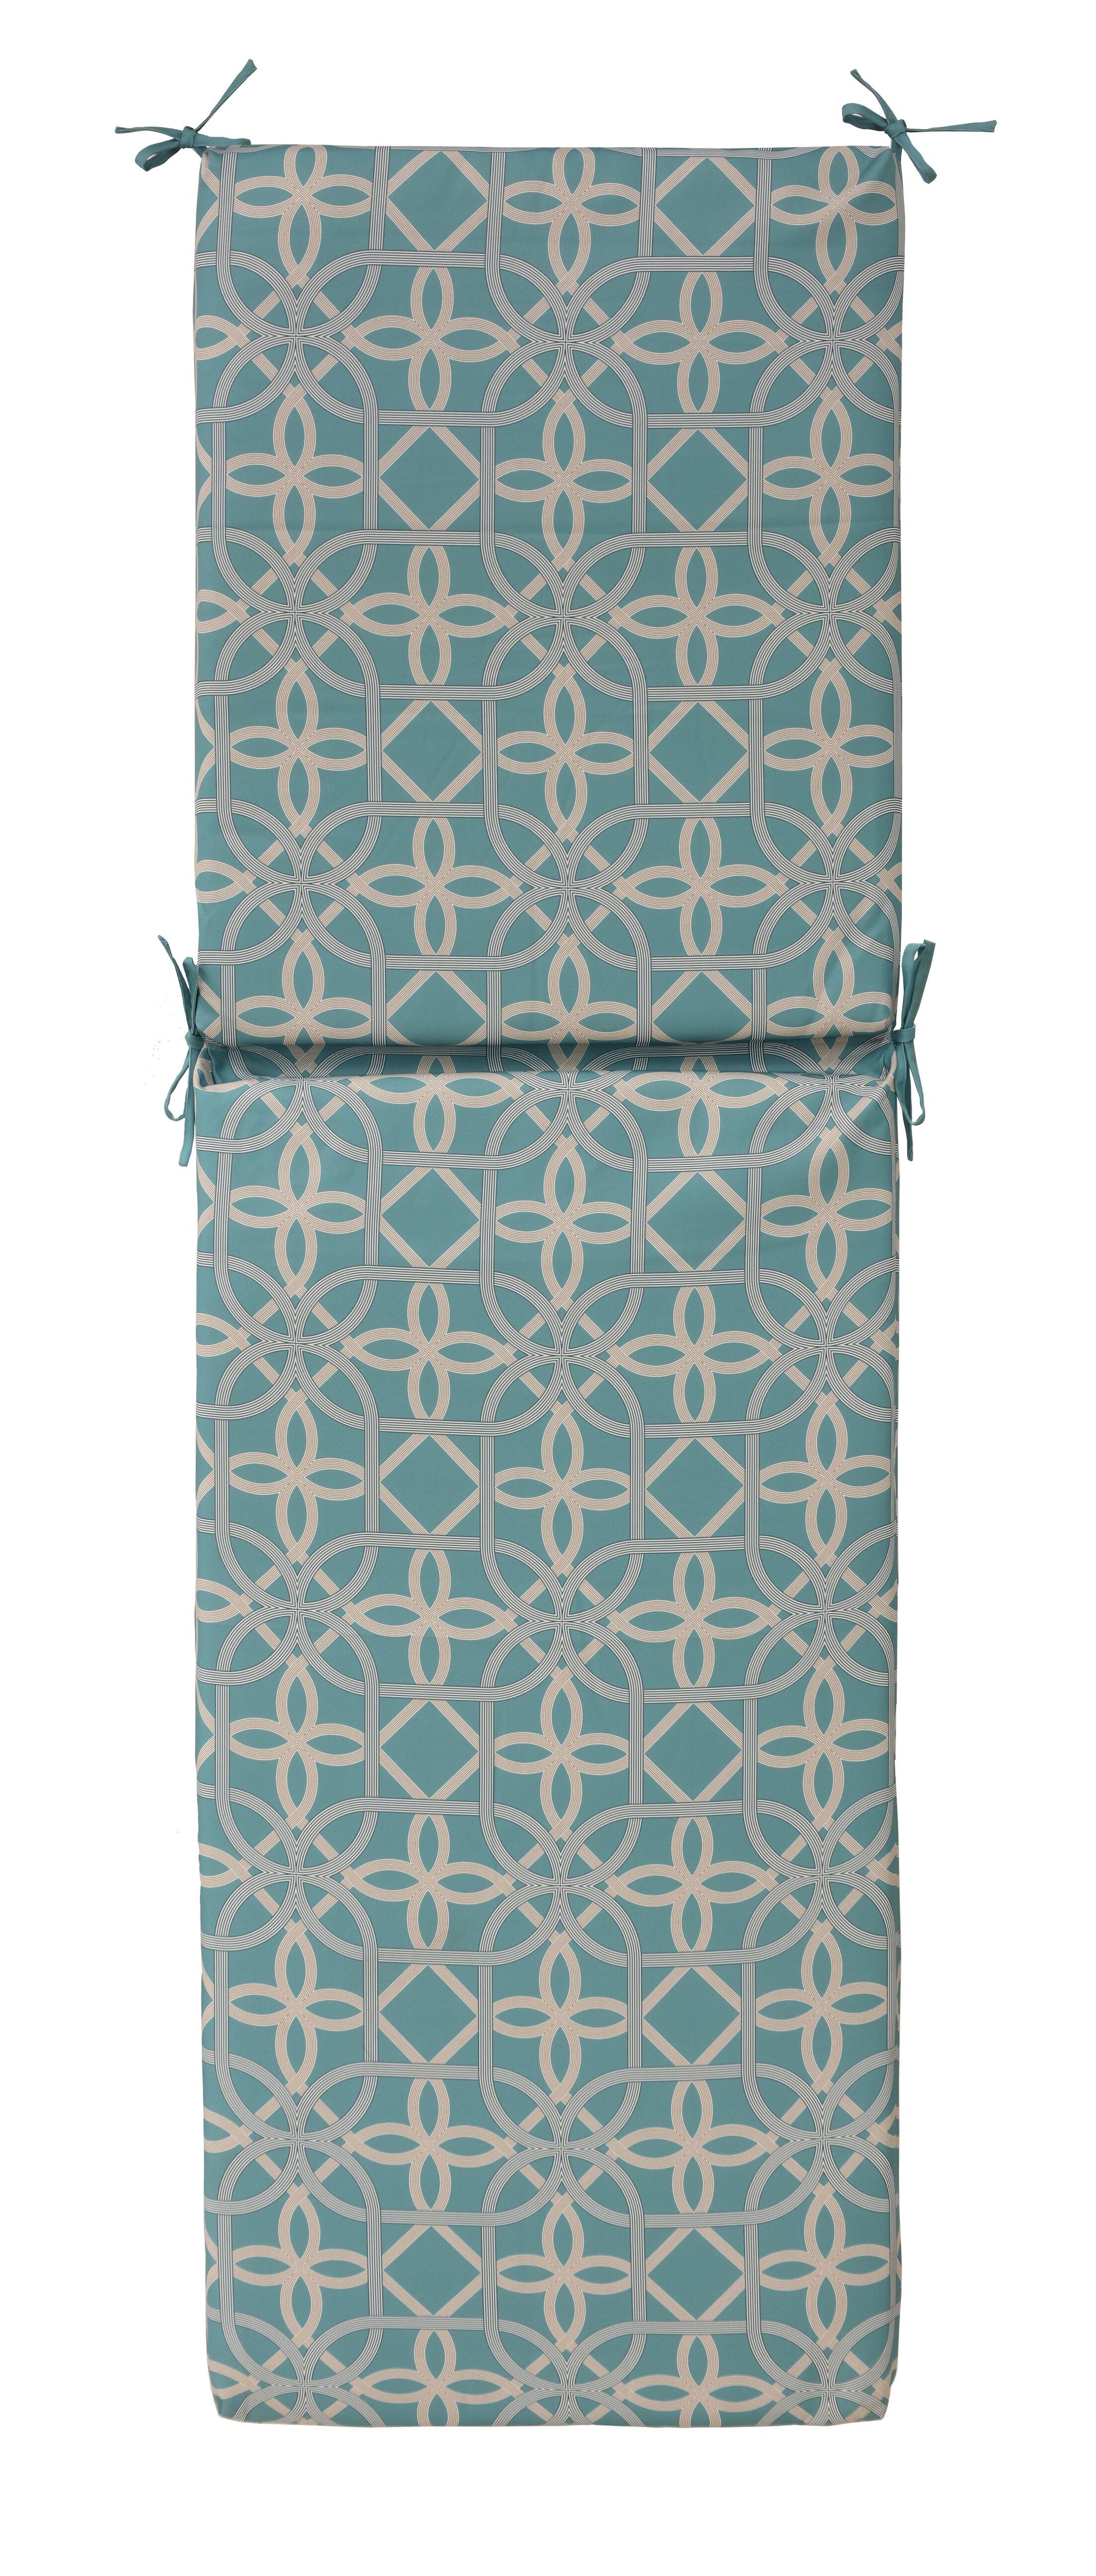 Indoor/Outdoor Chaise Lounge Cushion Fabric: Aqua